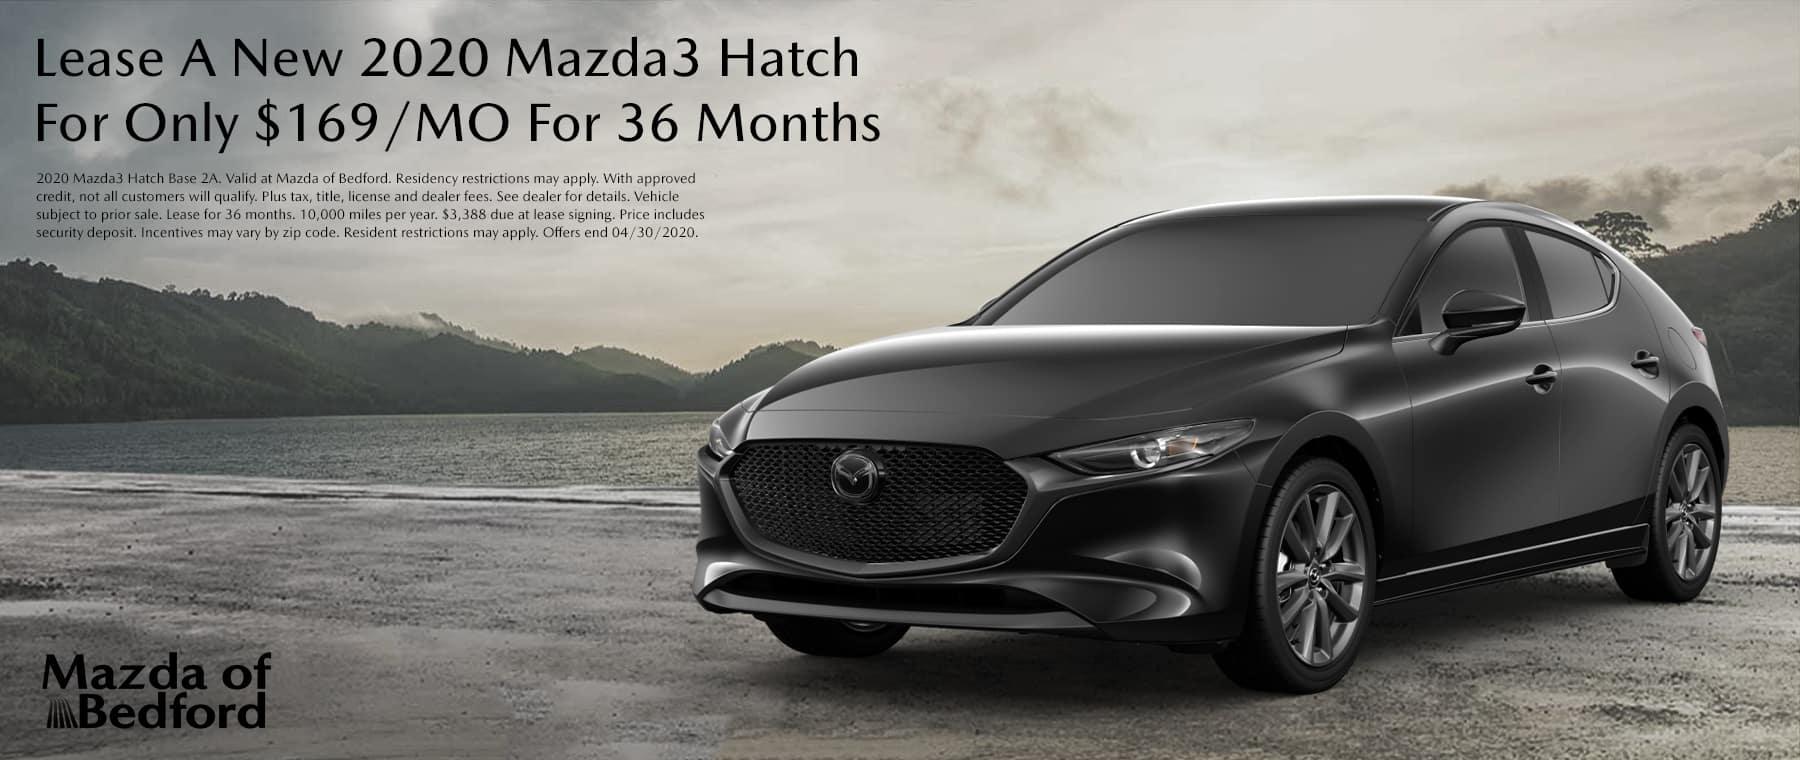 2020 Mazda3 Hatchback - Mazda of Bedford - Bedford, OH